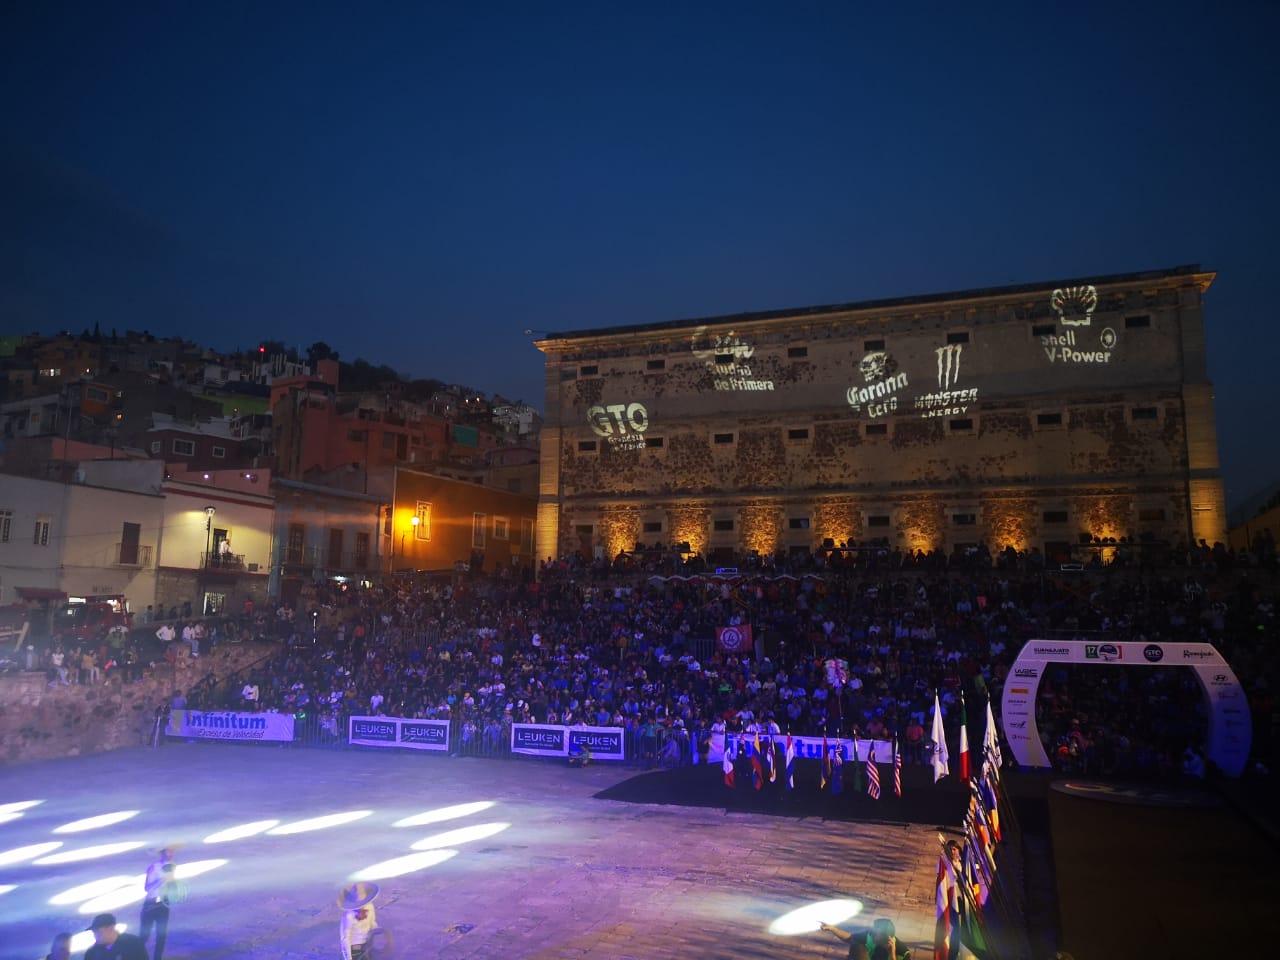 WRC: 17º Rallye Guanajuato Corona - México [12-15 Marzo] - Página 2 ES9AZsXXkAESrYQ?format=jpg&name=large